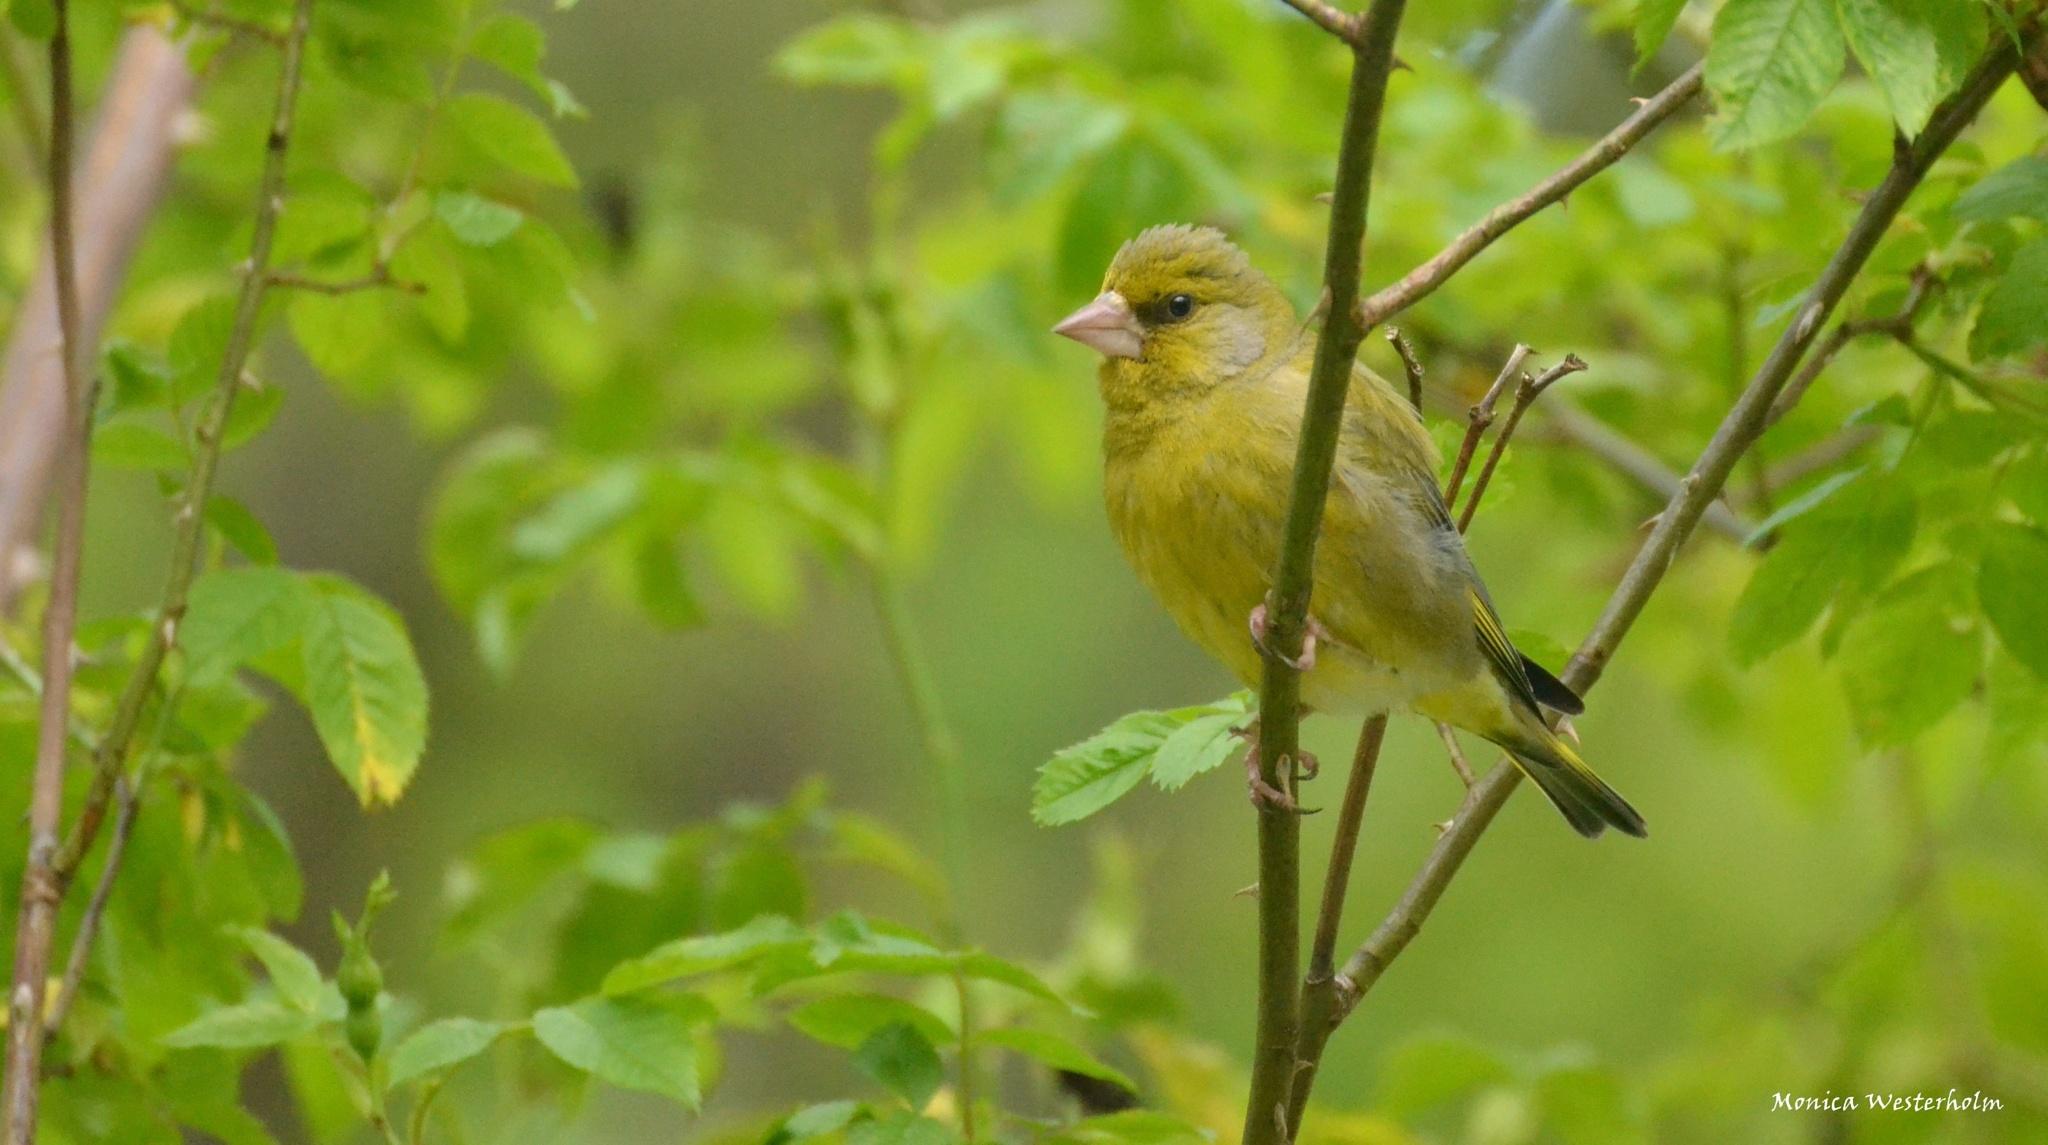 Greenfinch by monica.westerholm.5